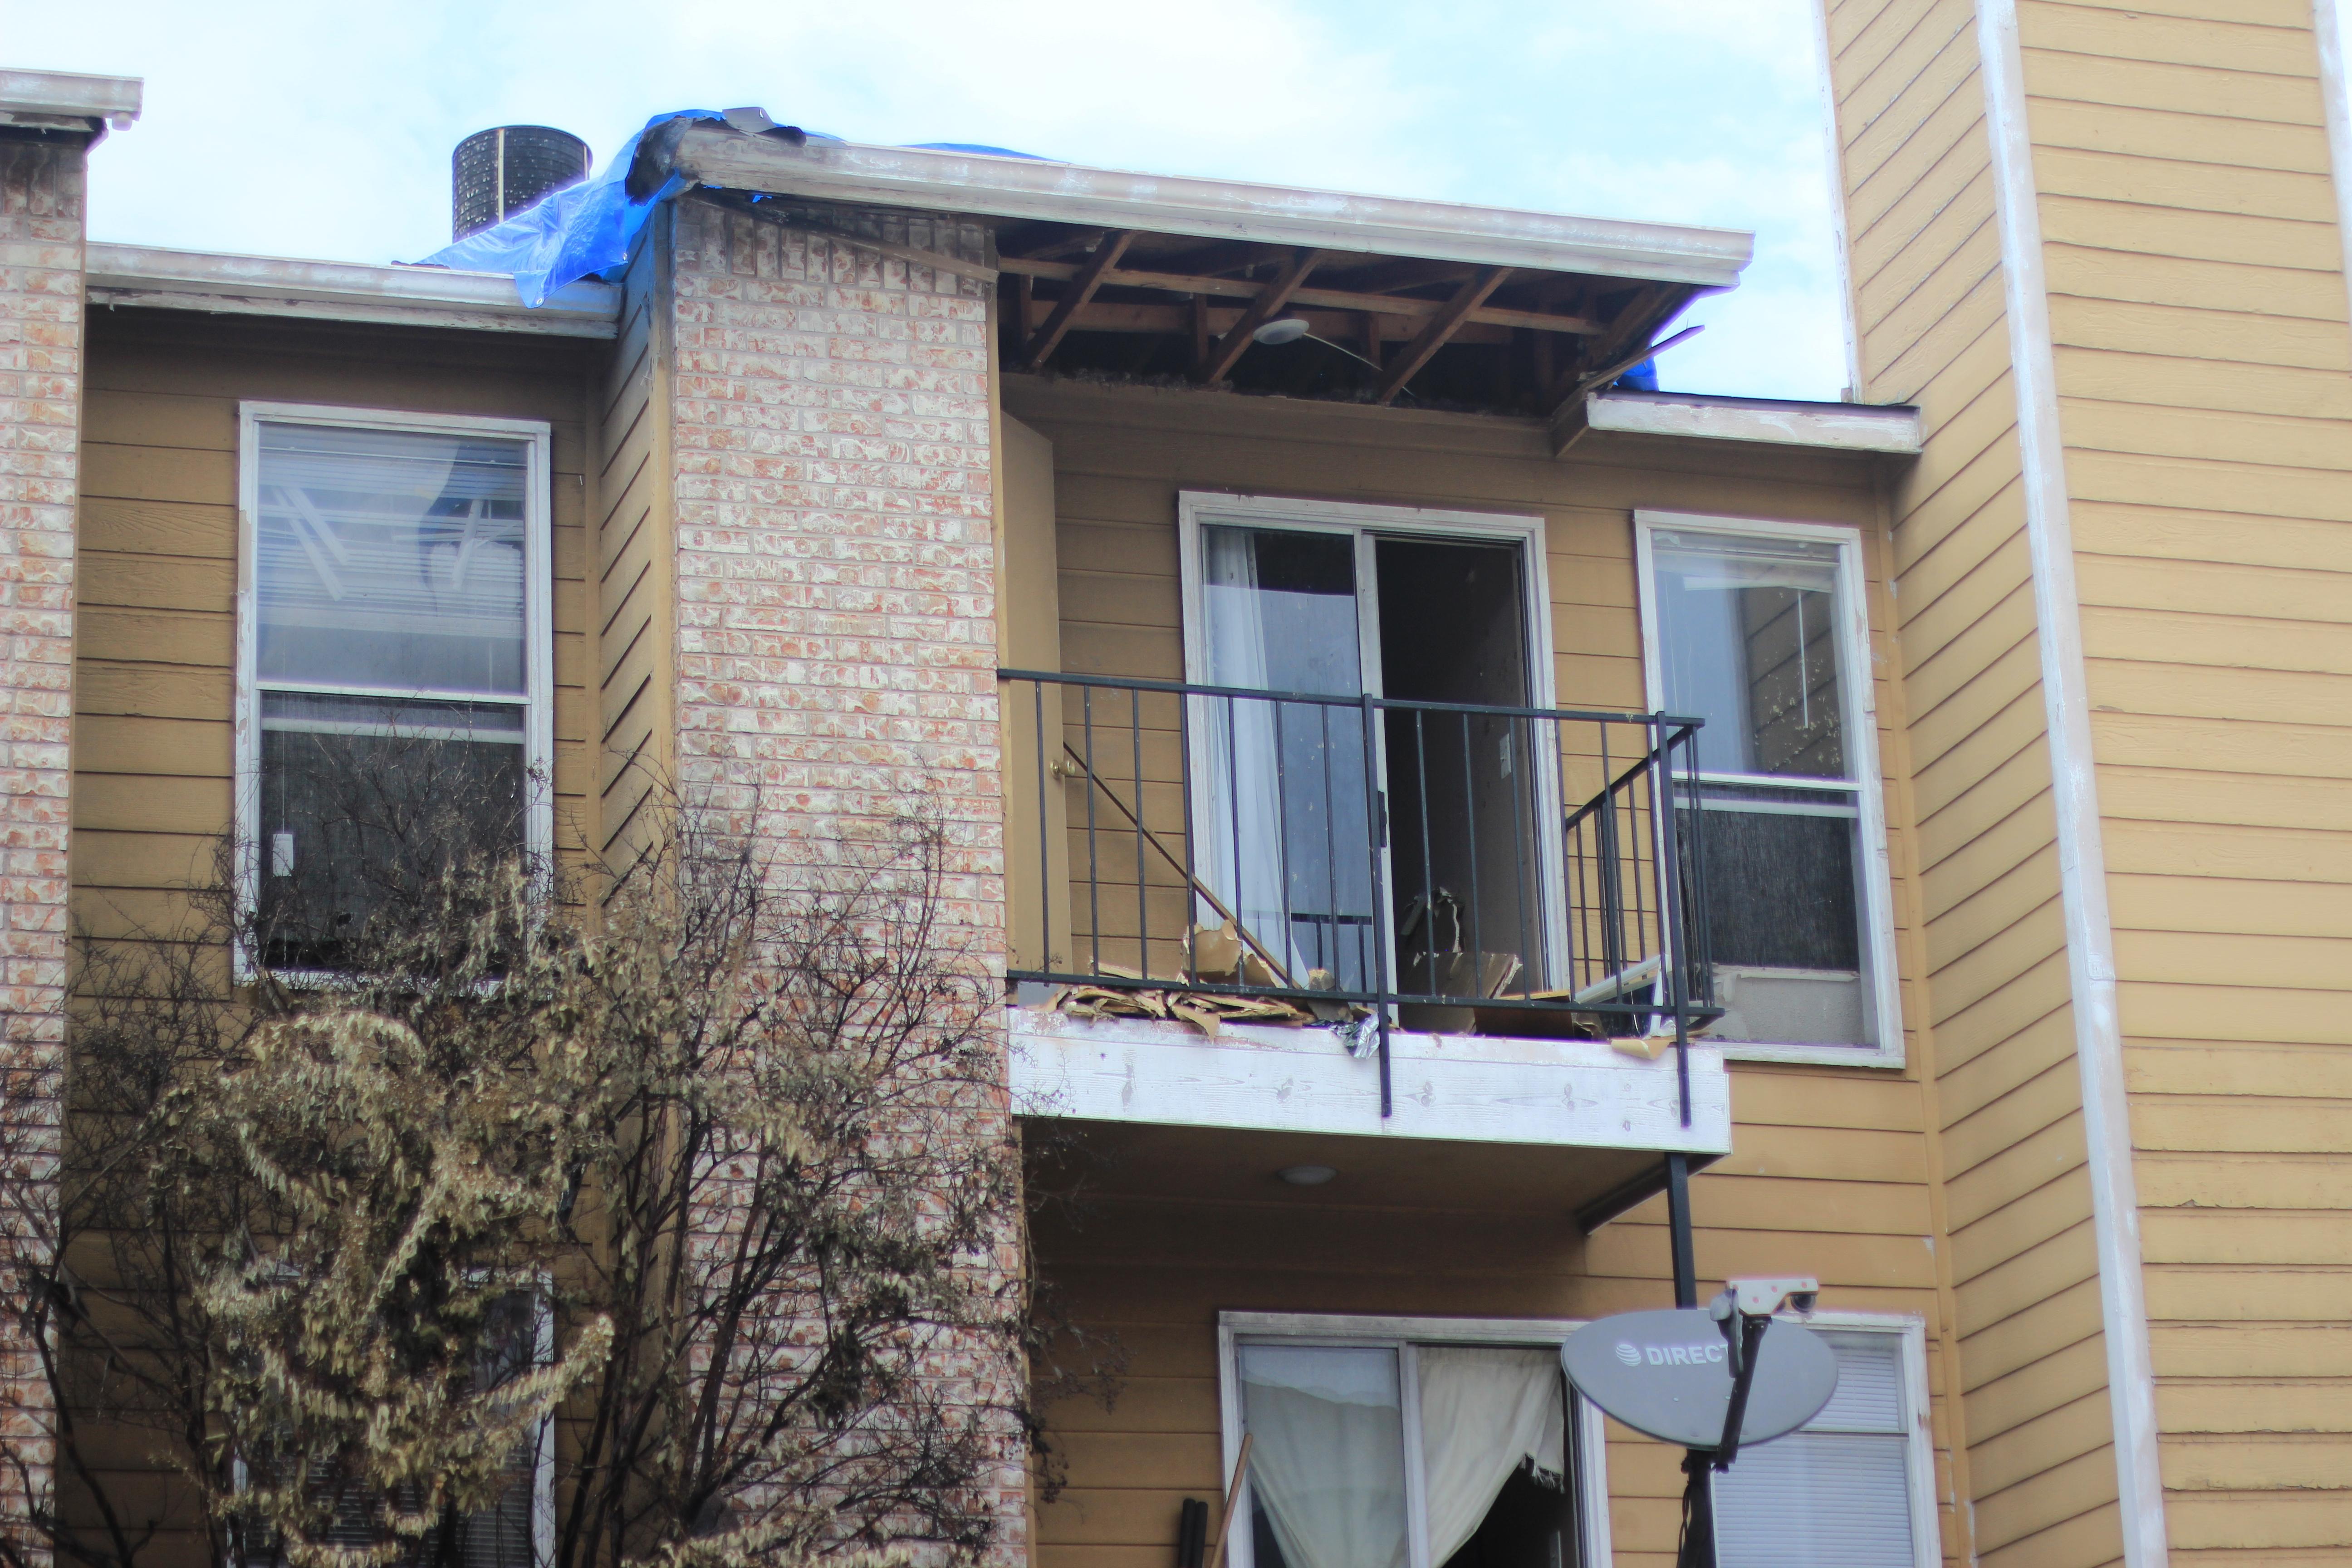 Fire at McCallum apartments damages building